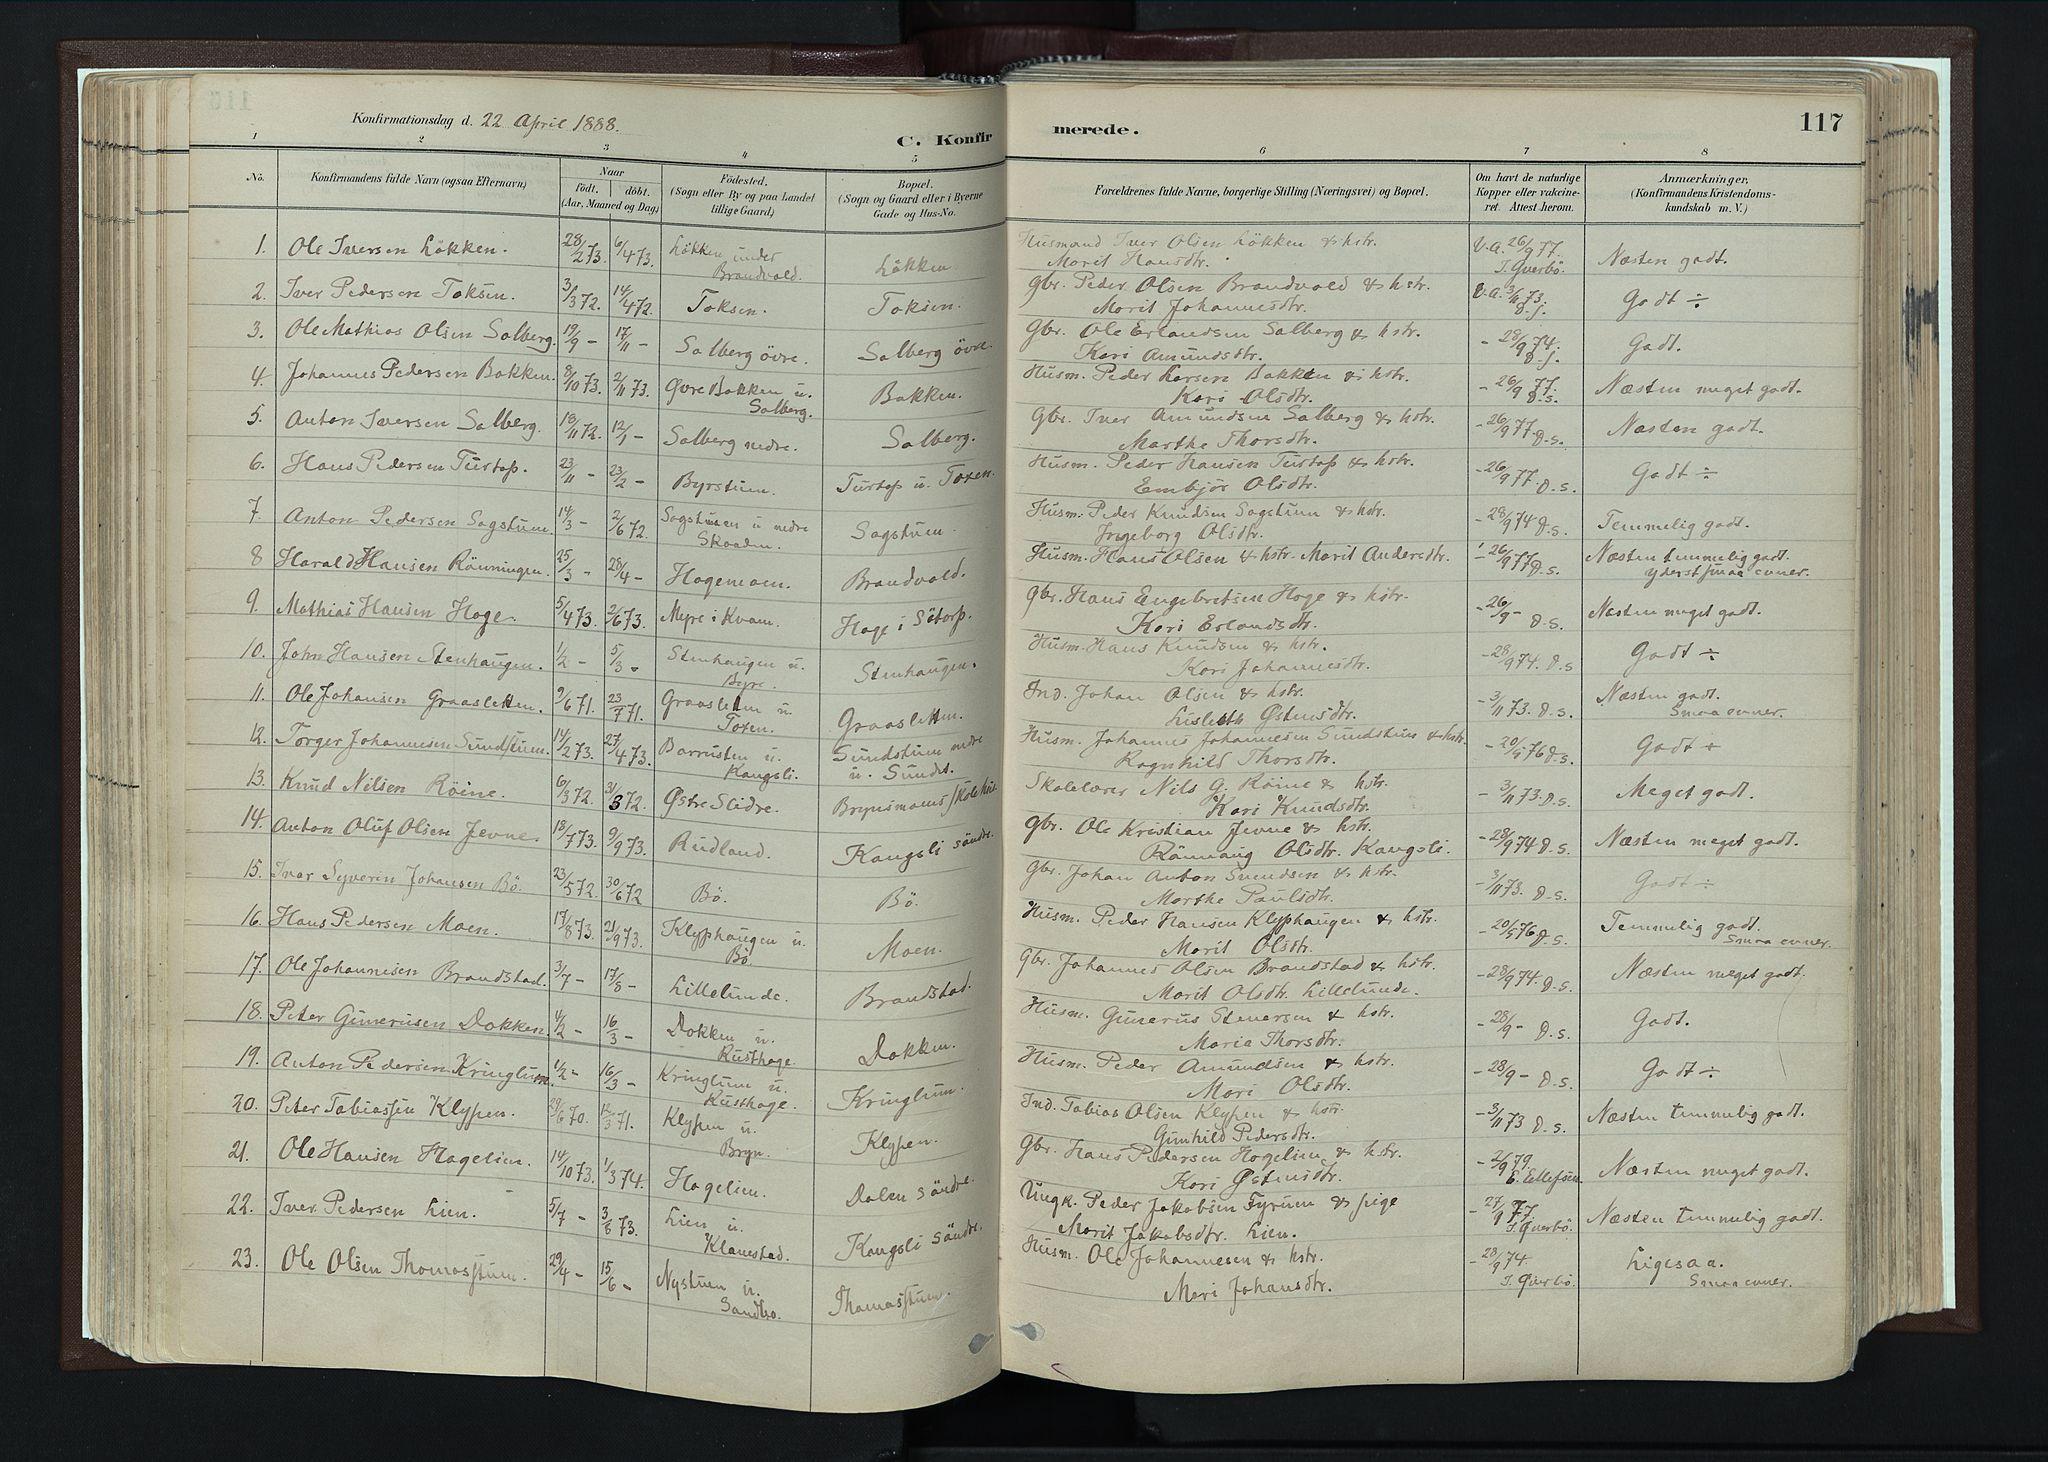 SAH, Nord-Fron prestekontor, Ministerialbok nr. 4, 1884-1914, s. 117